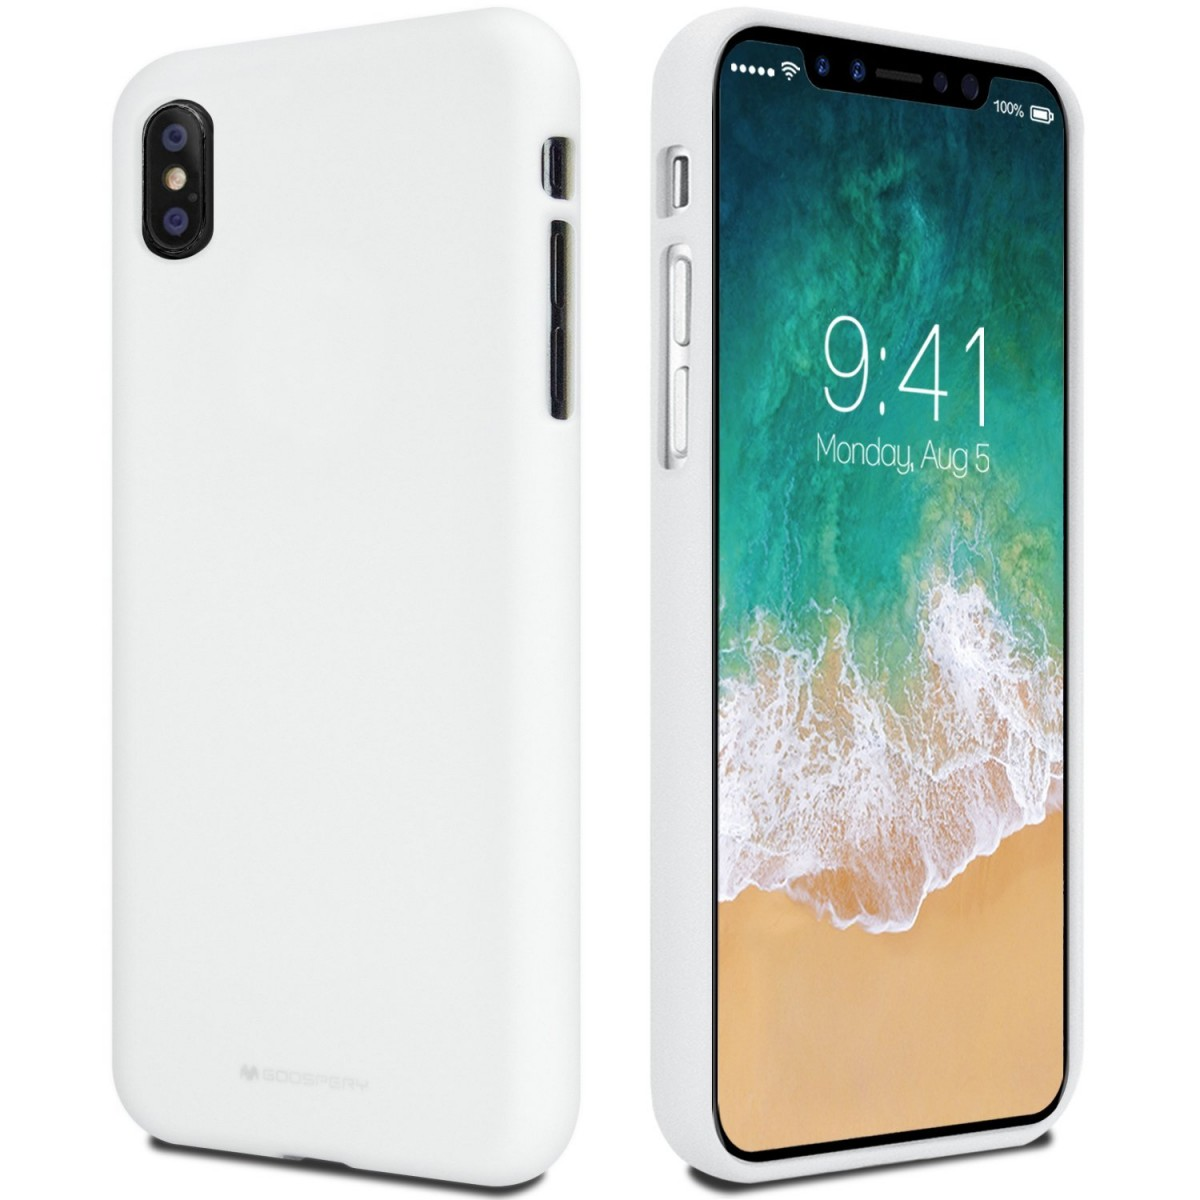 Pouzdro Mercury Soft feeling Apple iPhone X bílé